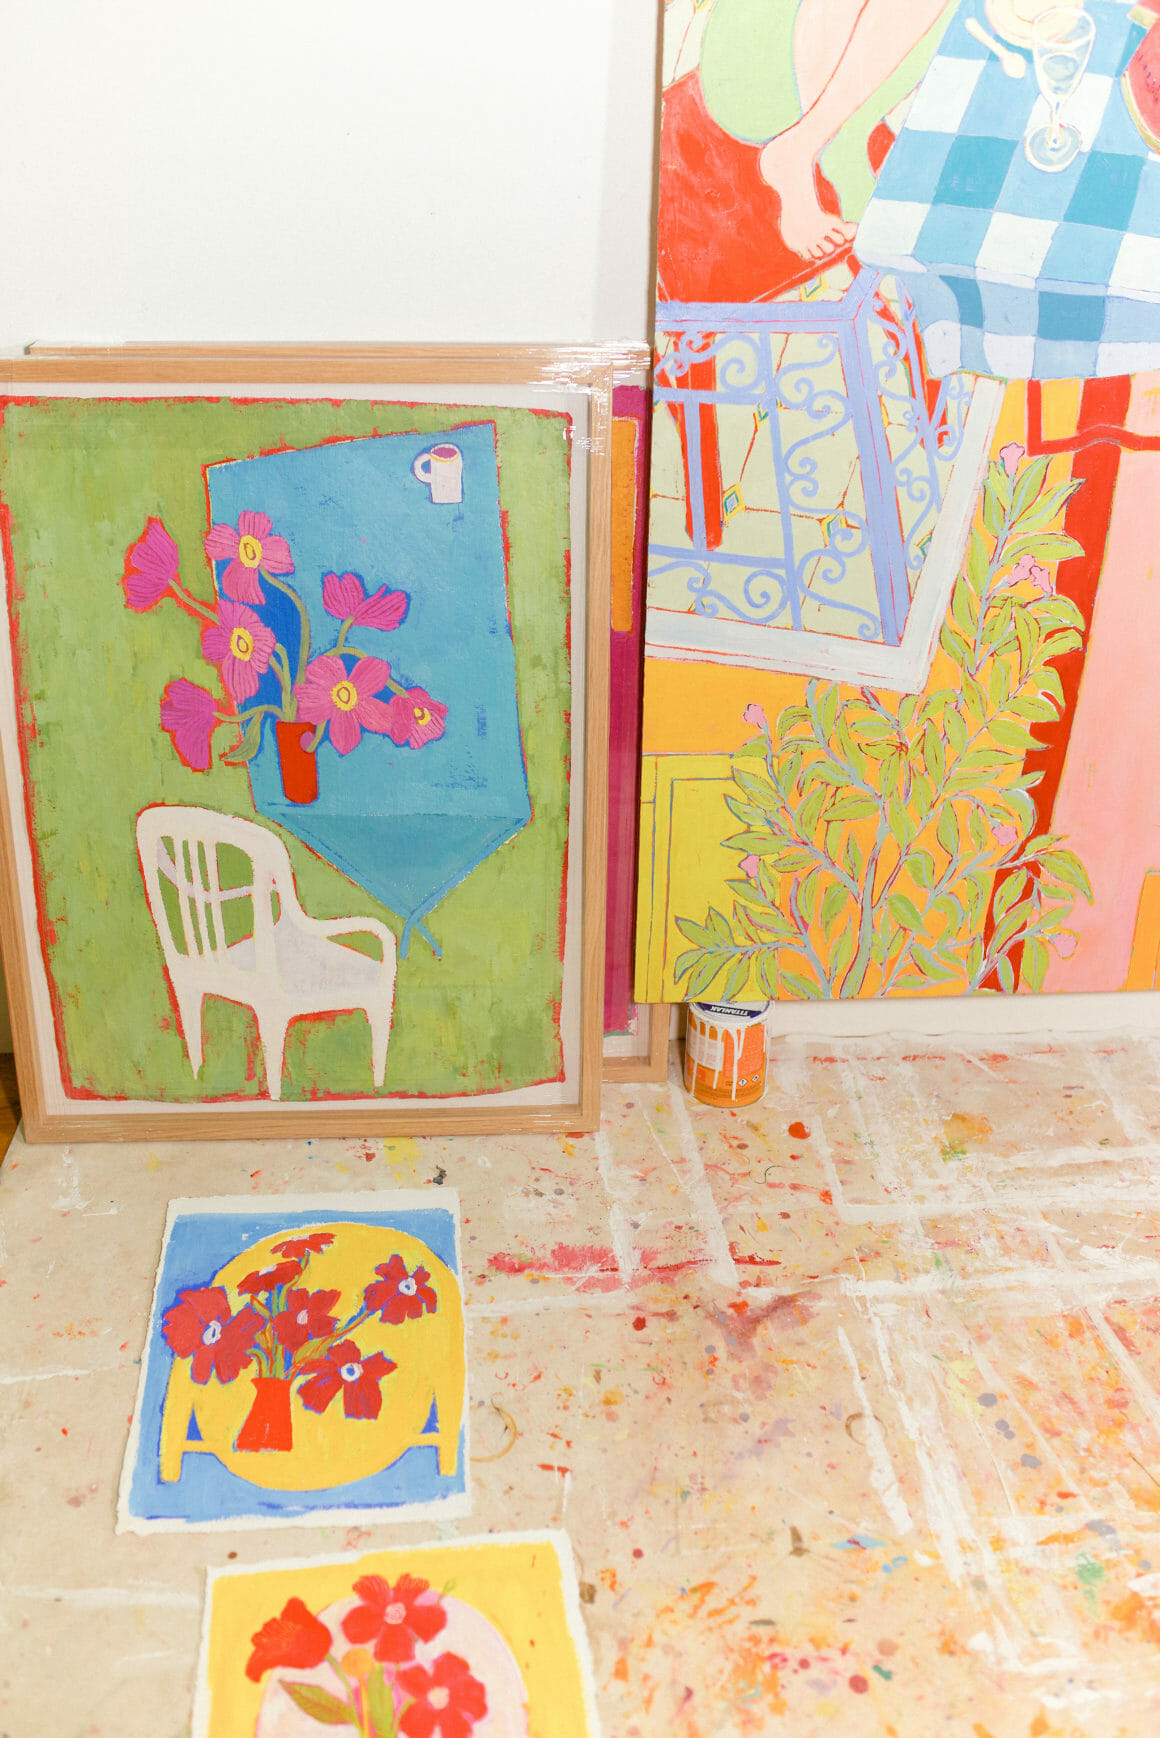 Studio de Miriam Dema